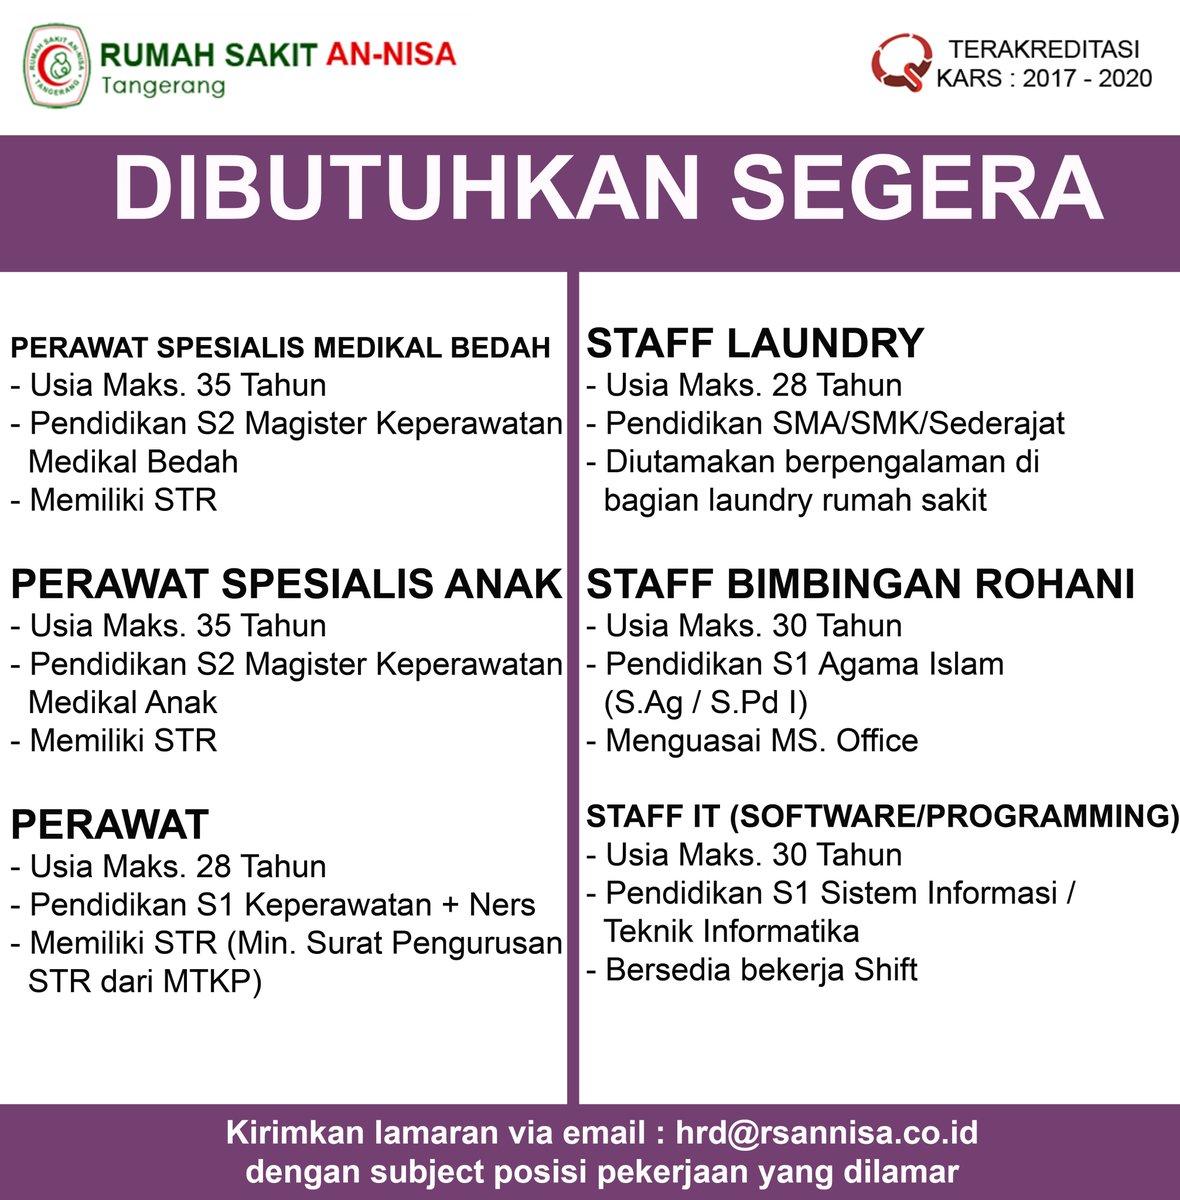 Rs Annisa Tangerang Auf Twitter Loker Lokerrumahsakit